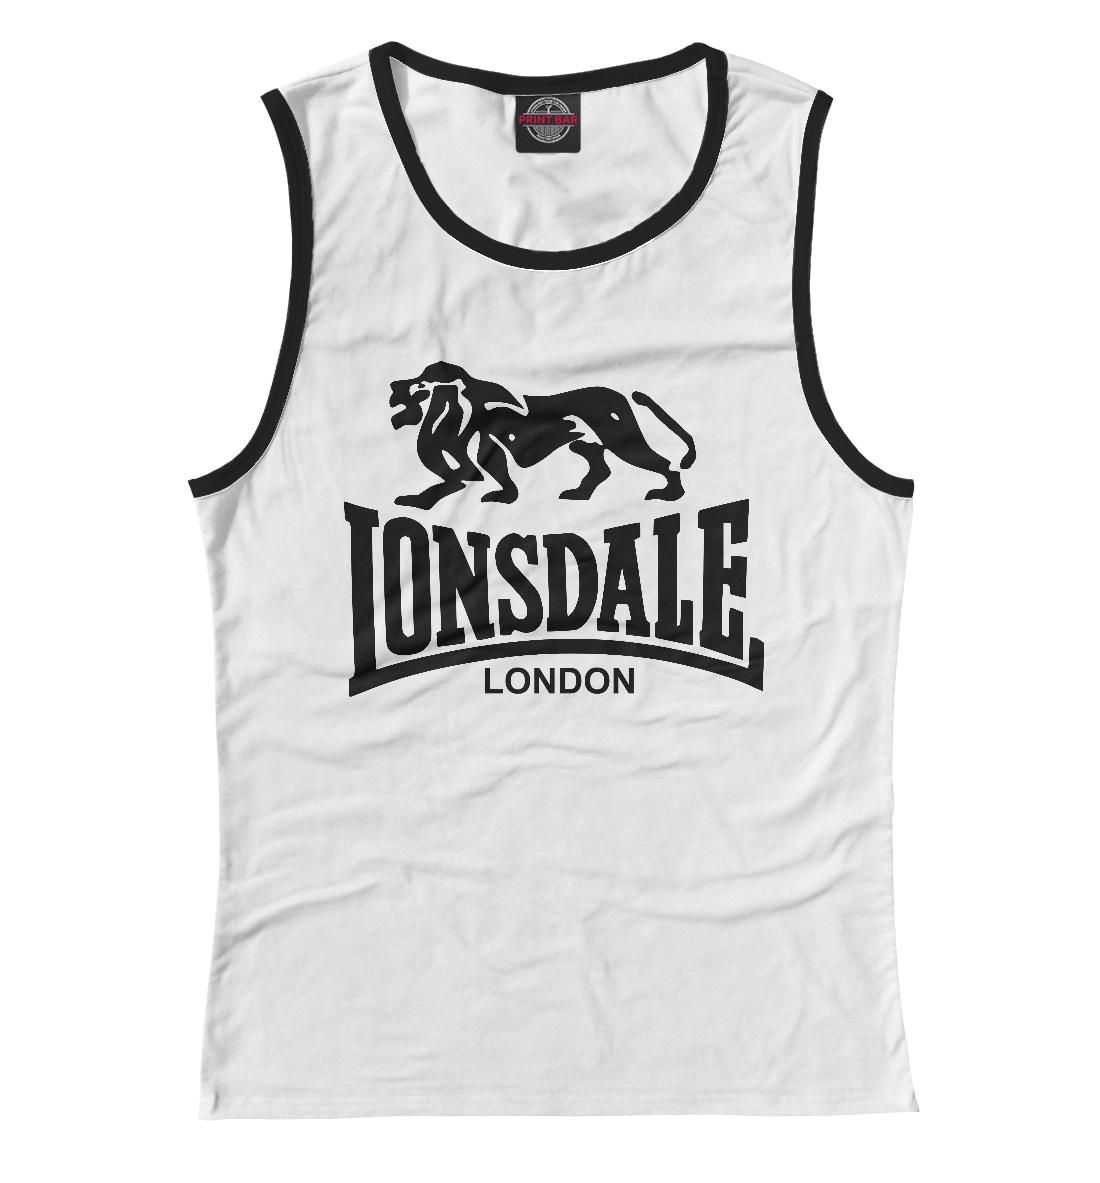 Lonsdale London